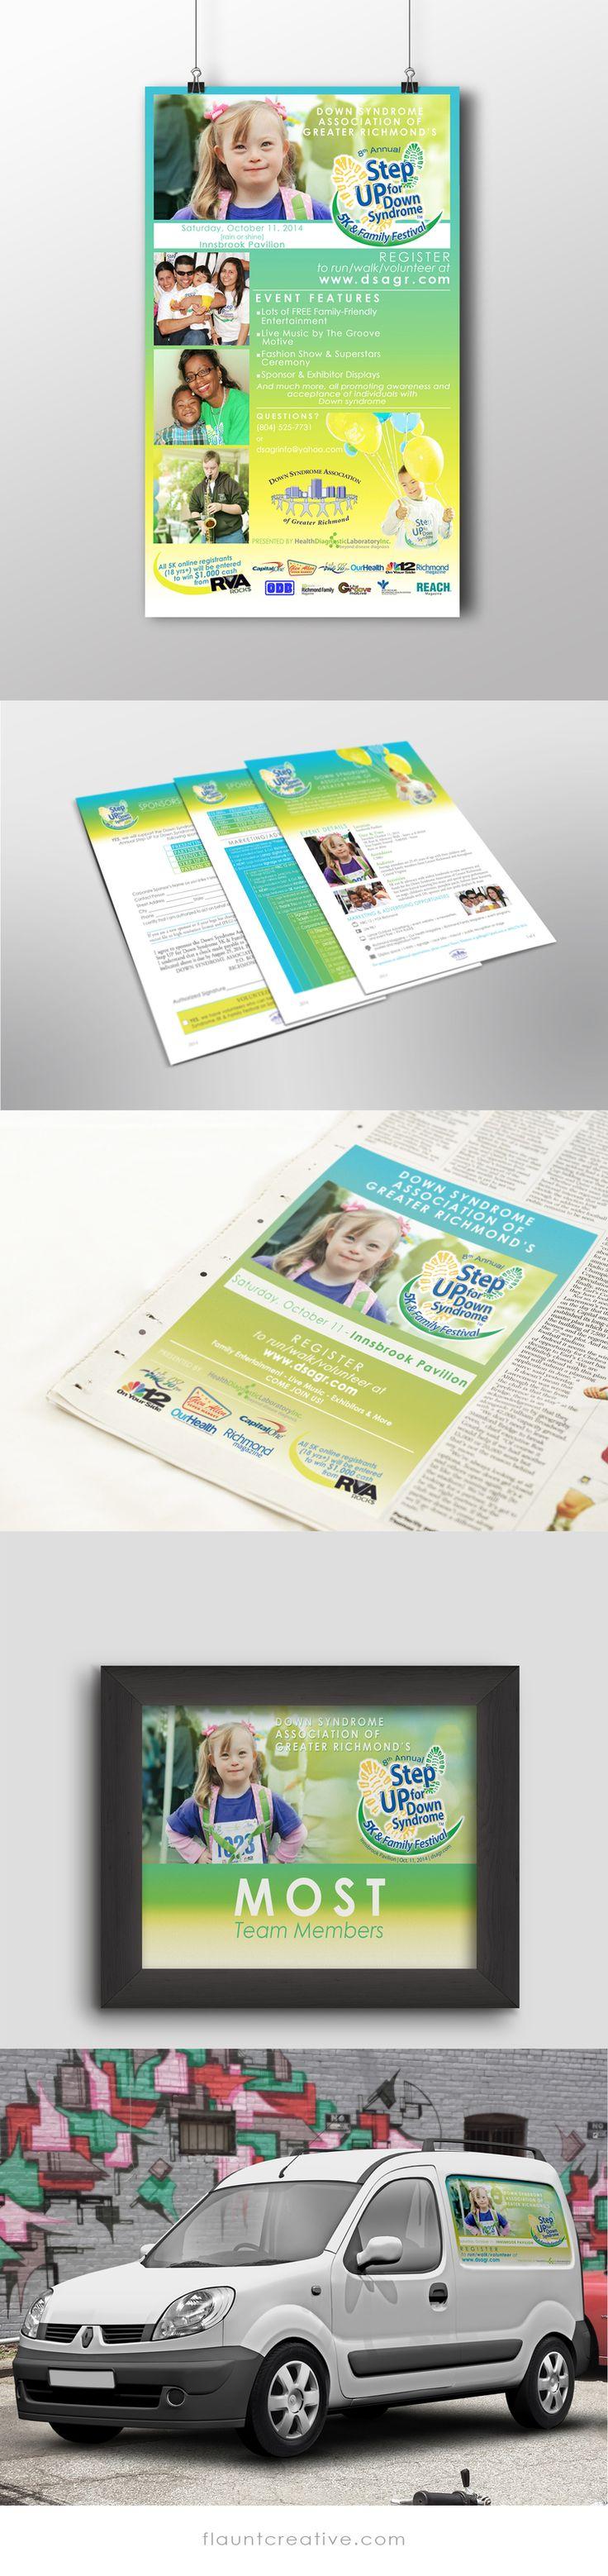 5k poster design - Step Up For Down Syndrome 5k